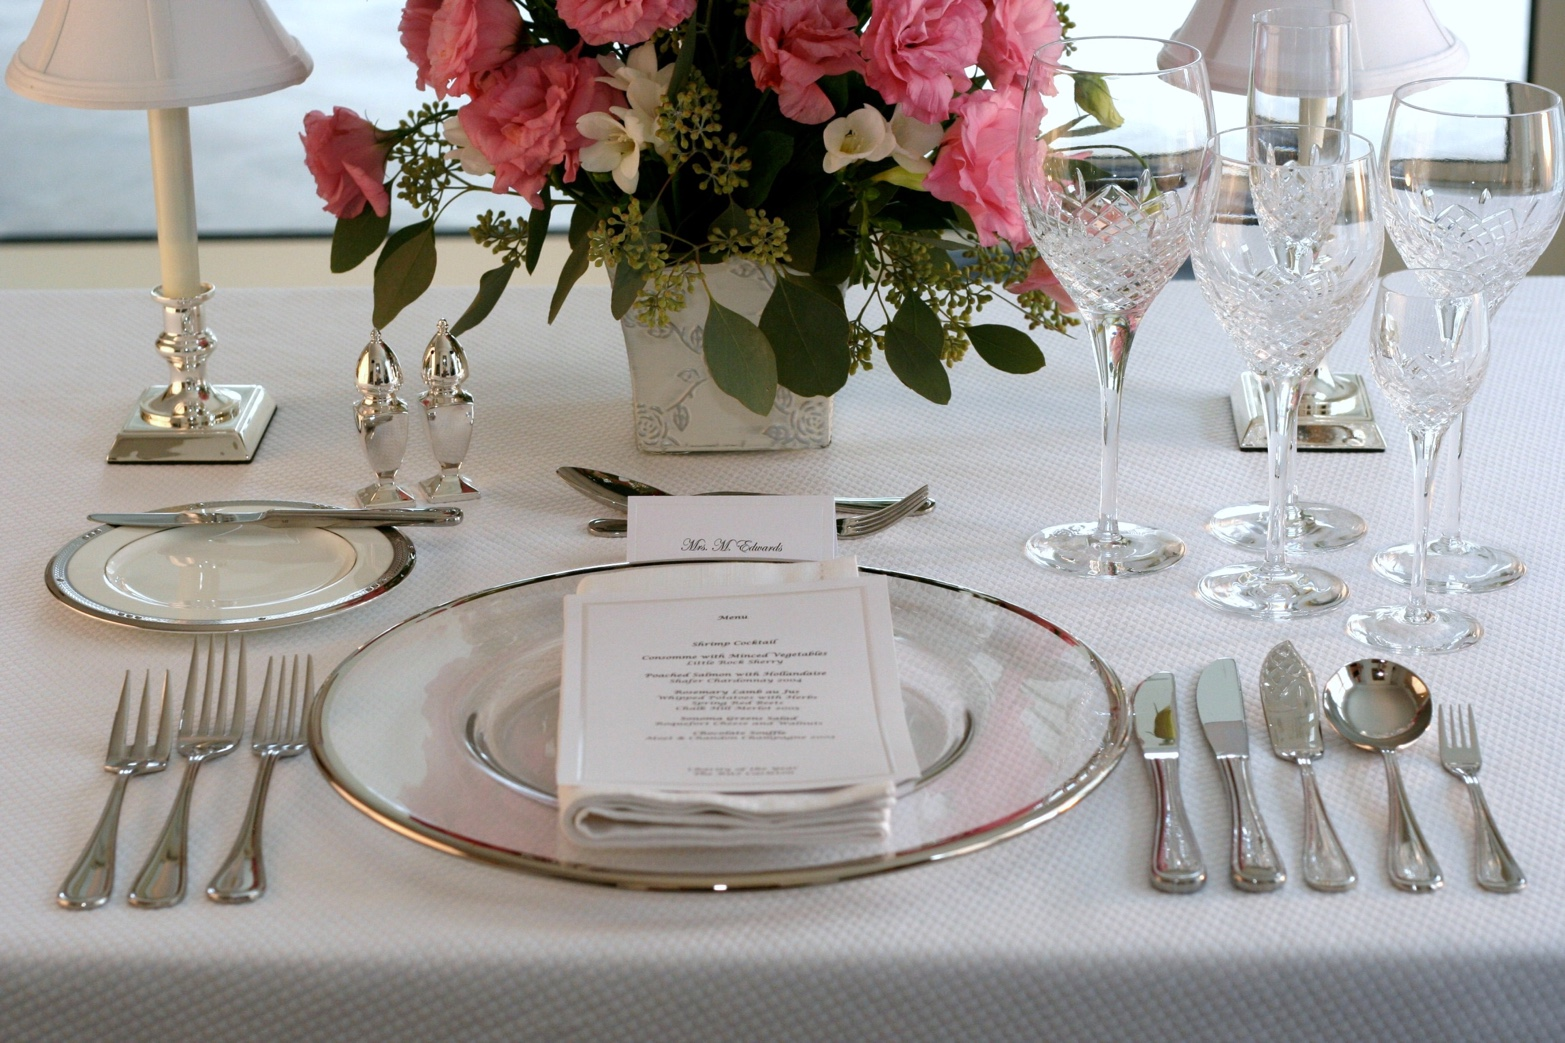 E-learning dining etiquette